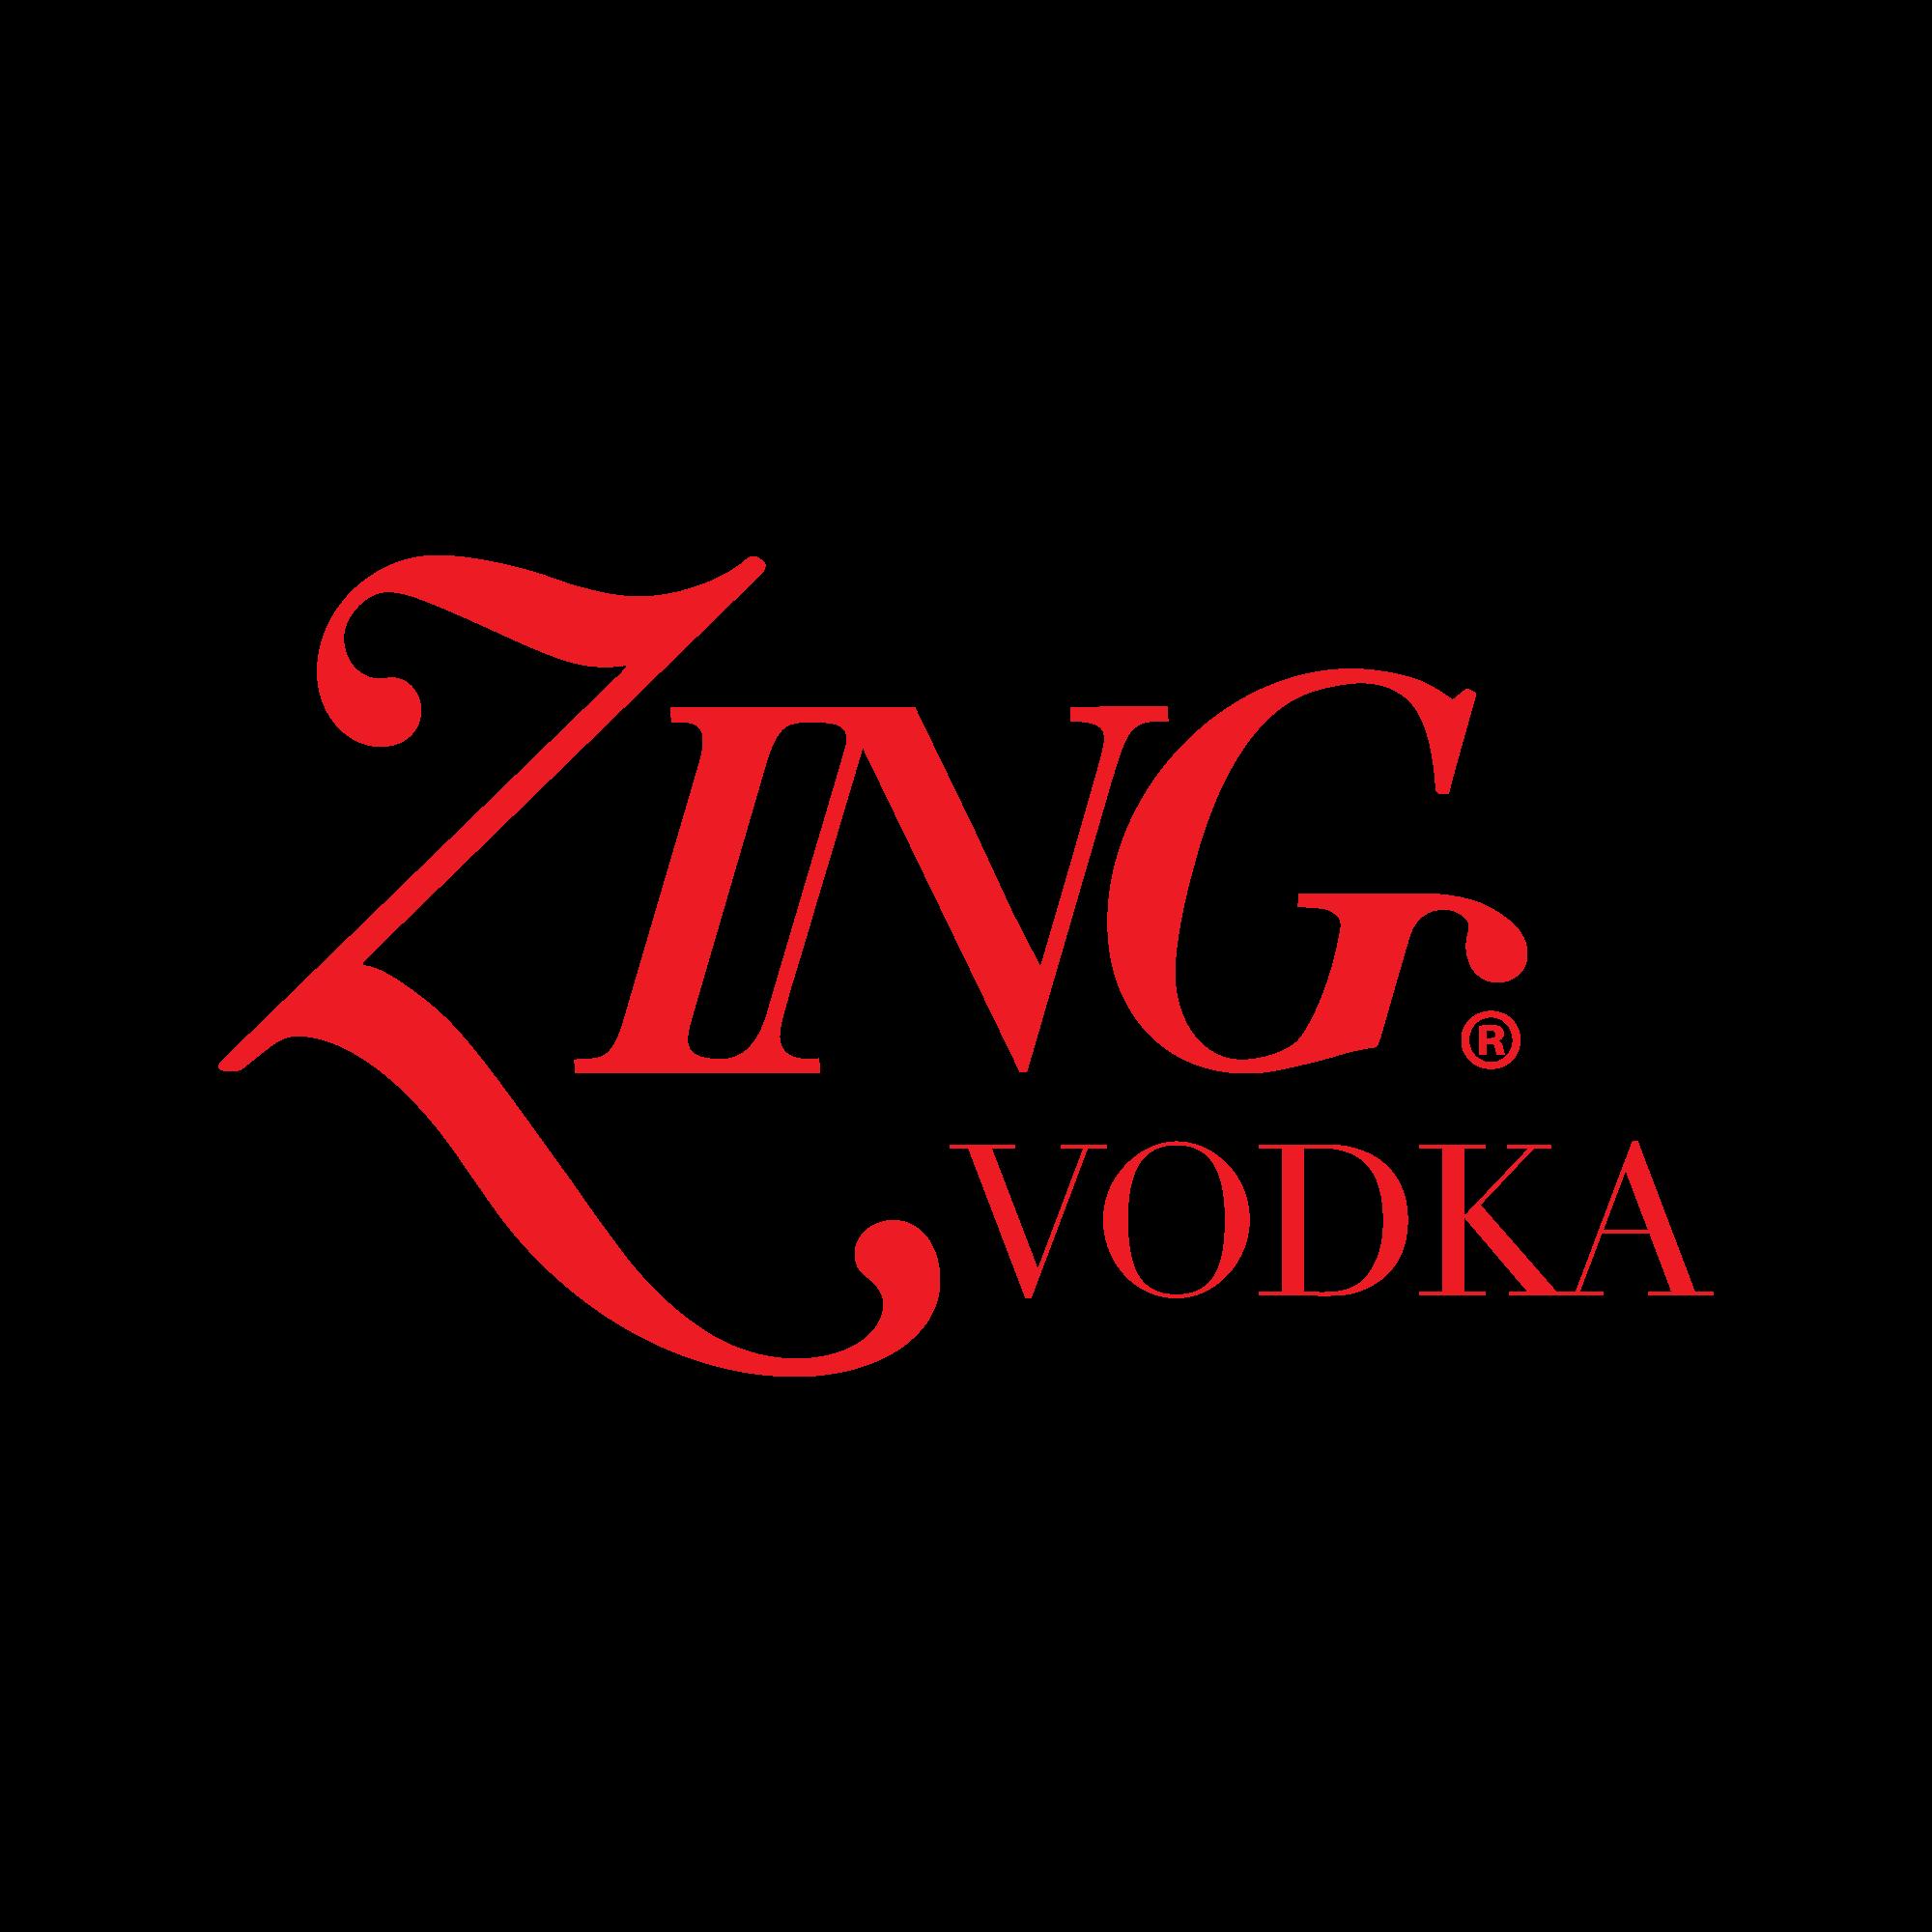 Zing Vodka RED